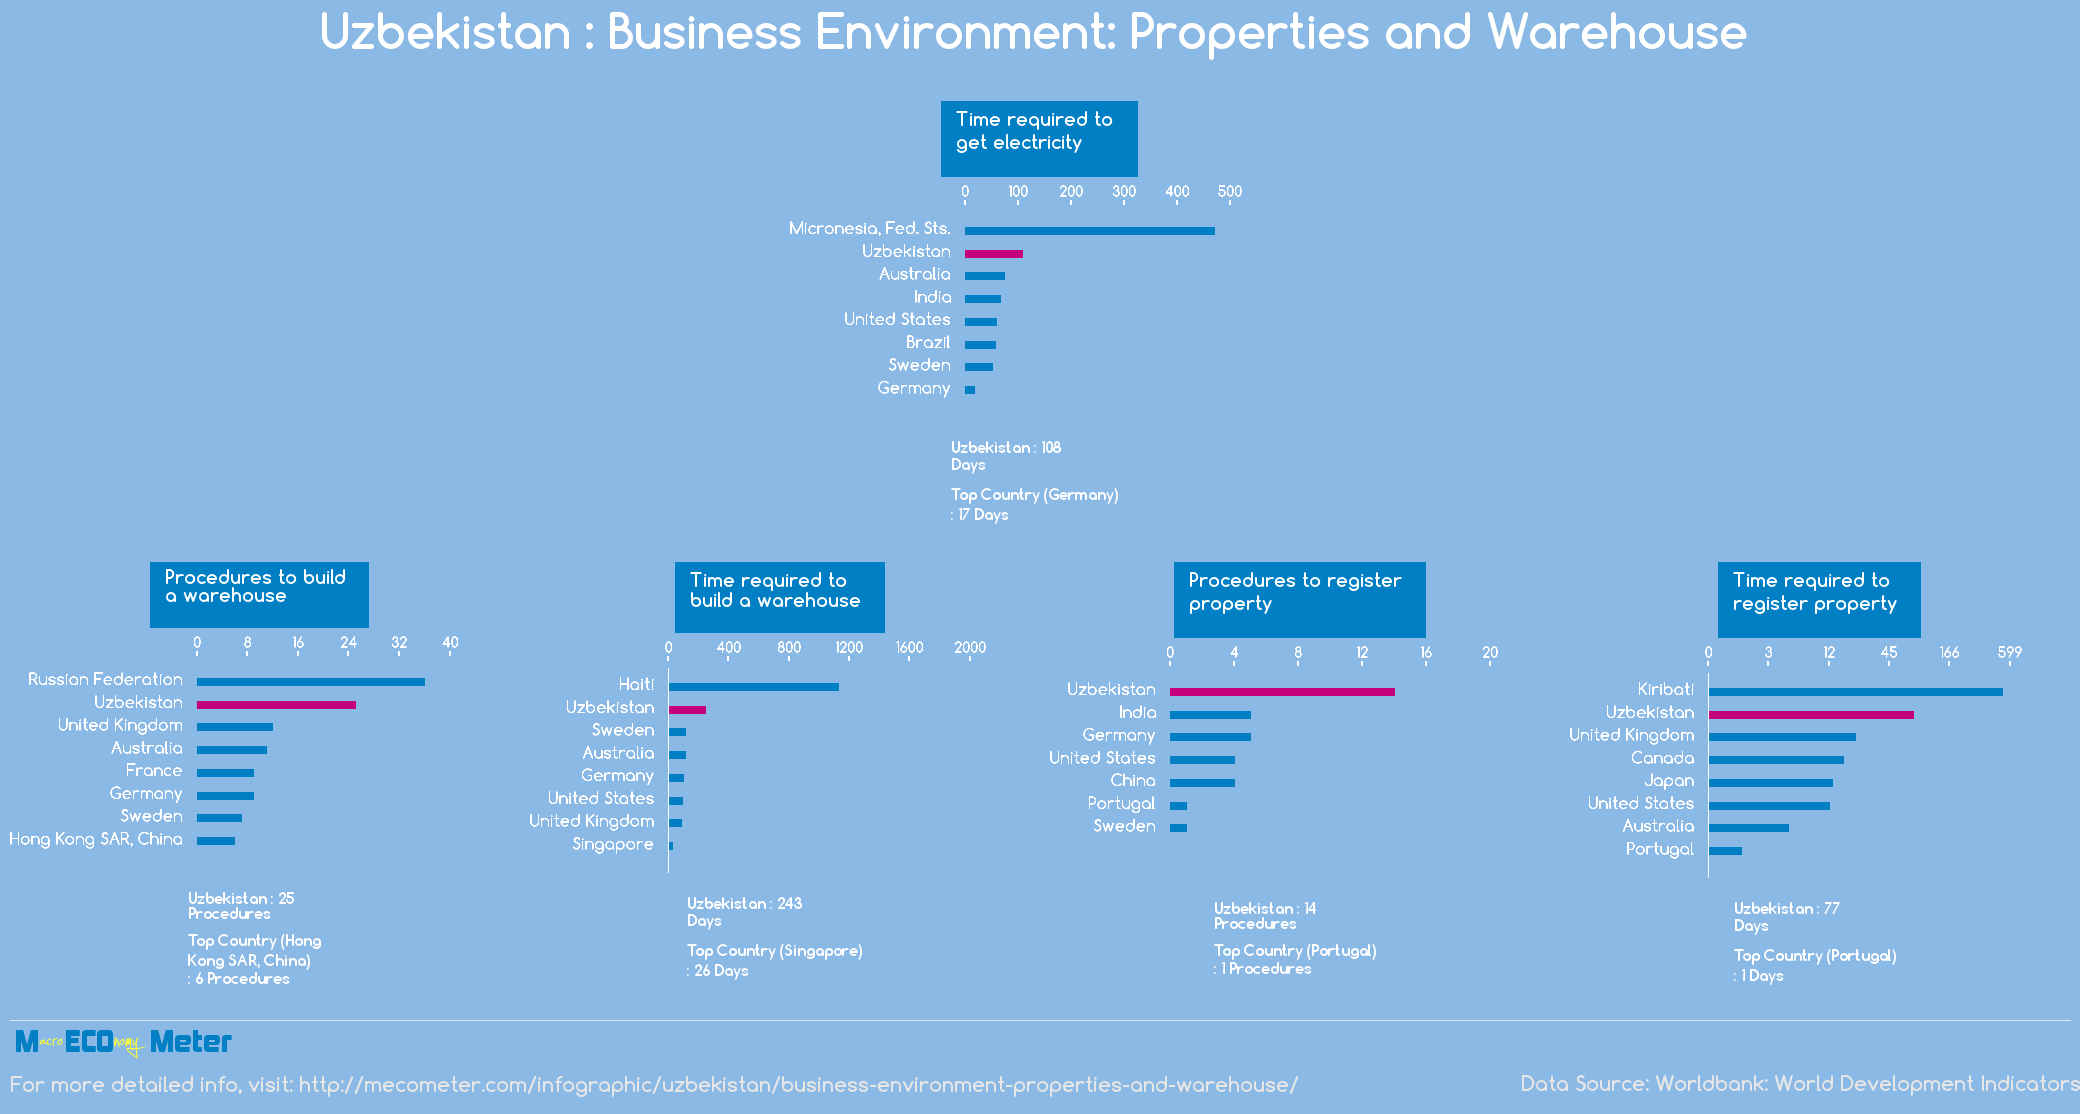 Uzbekistan : Business Environment: Properties and Warehouse